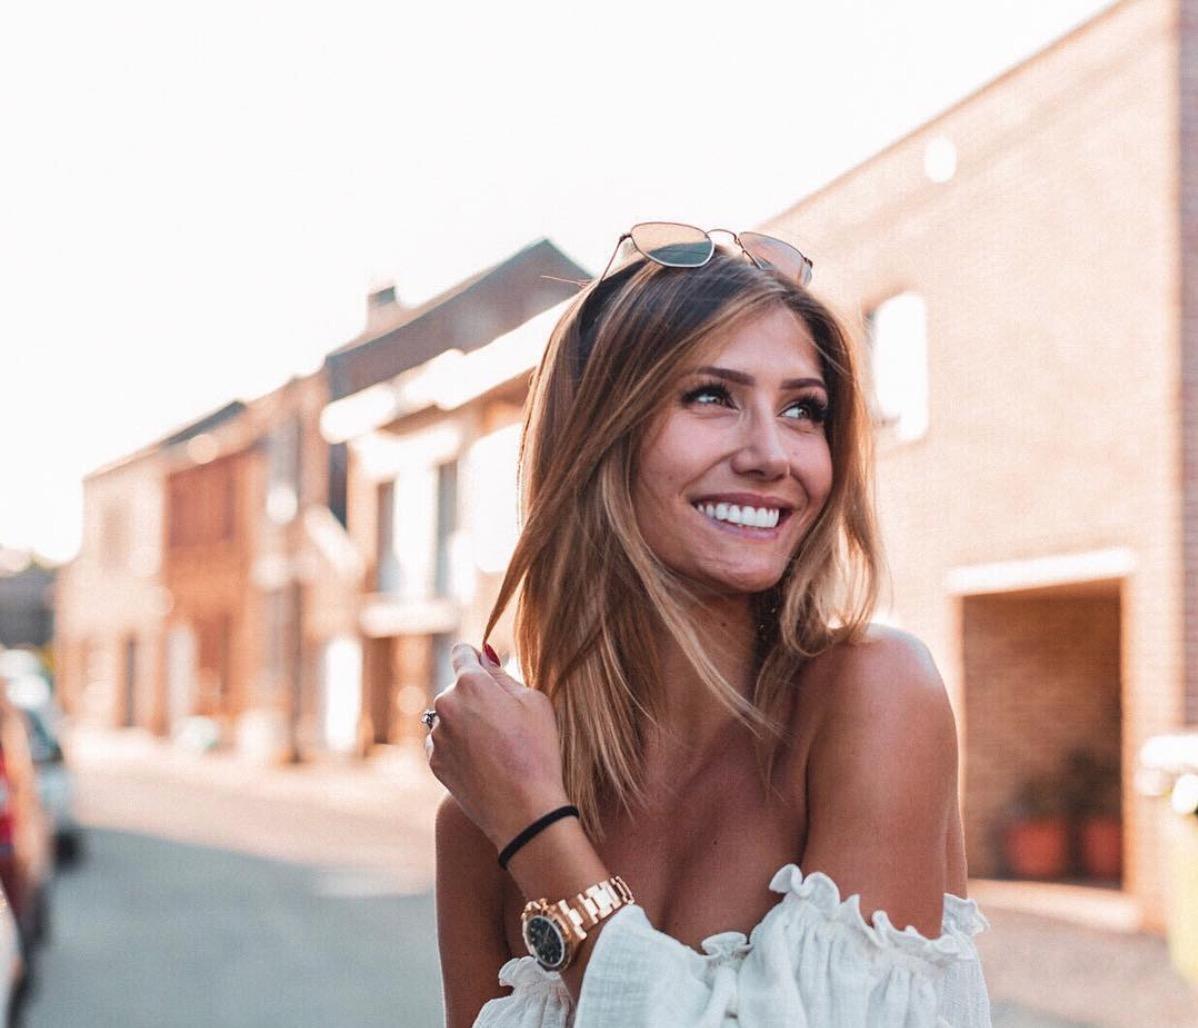 Yannick Carrasco's Girlfriend Noémie Happart - futbolife.info